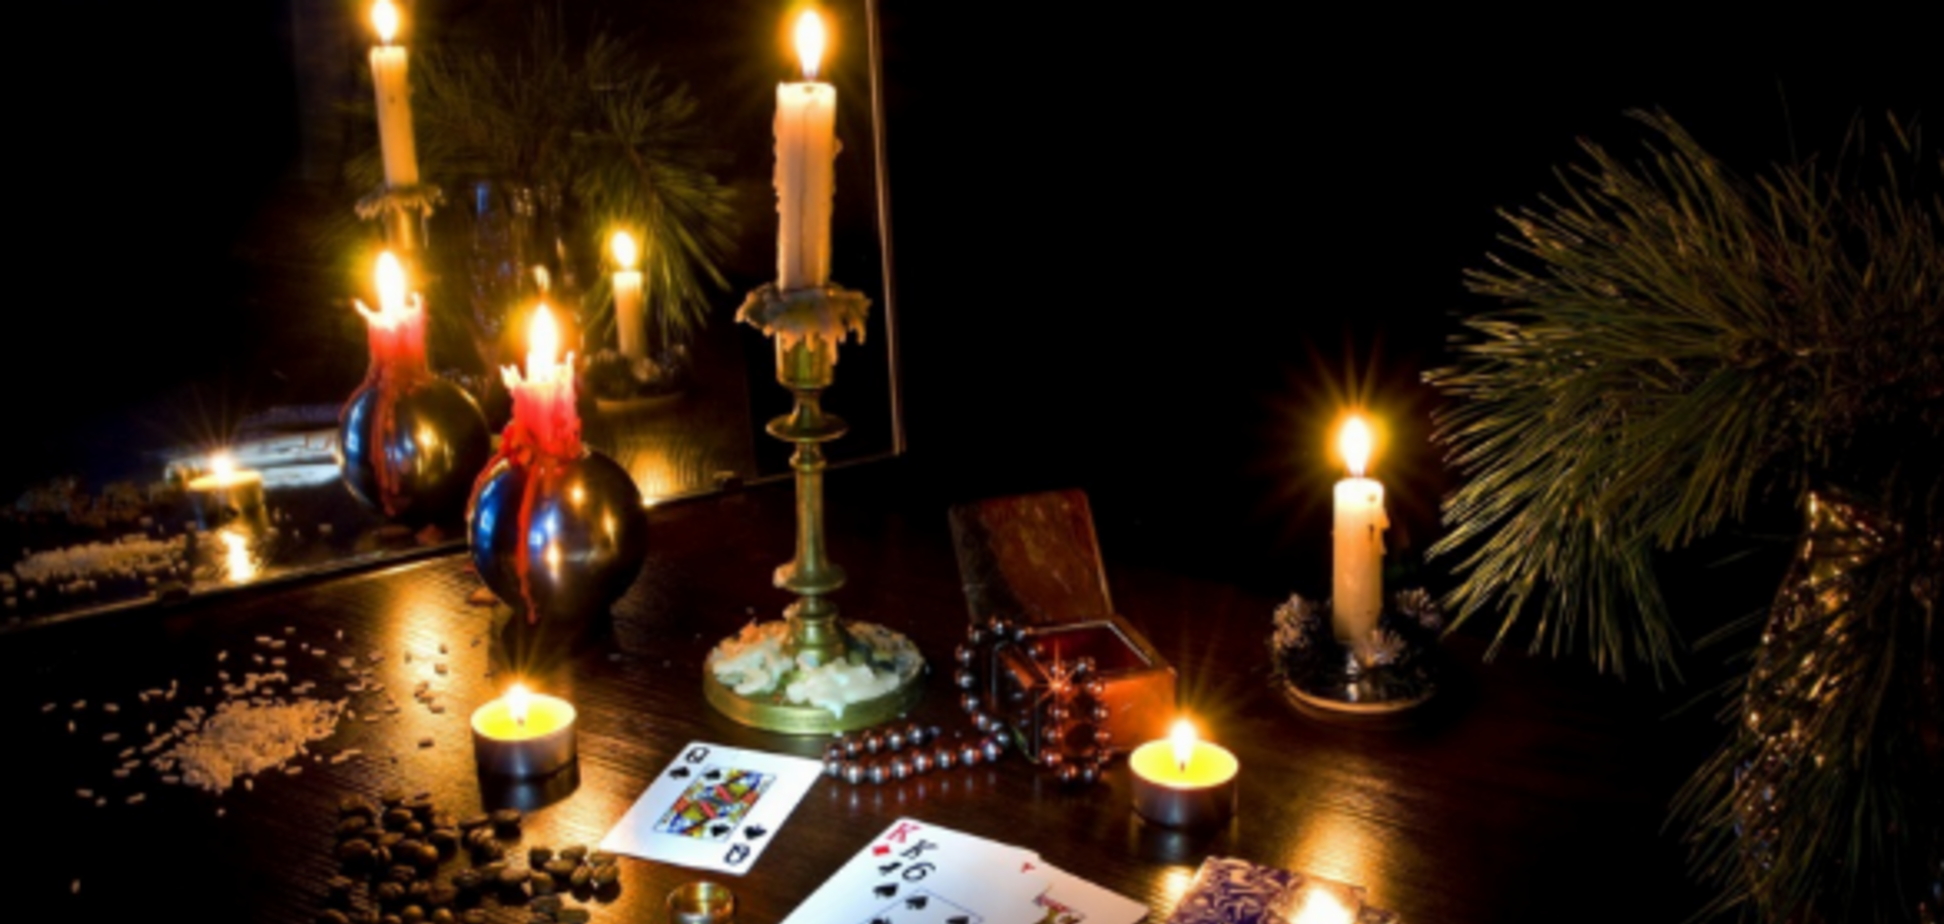 Гороскоп на 23 января для всех знаков Зодиака по картам Таро: кого ждут неприятности